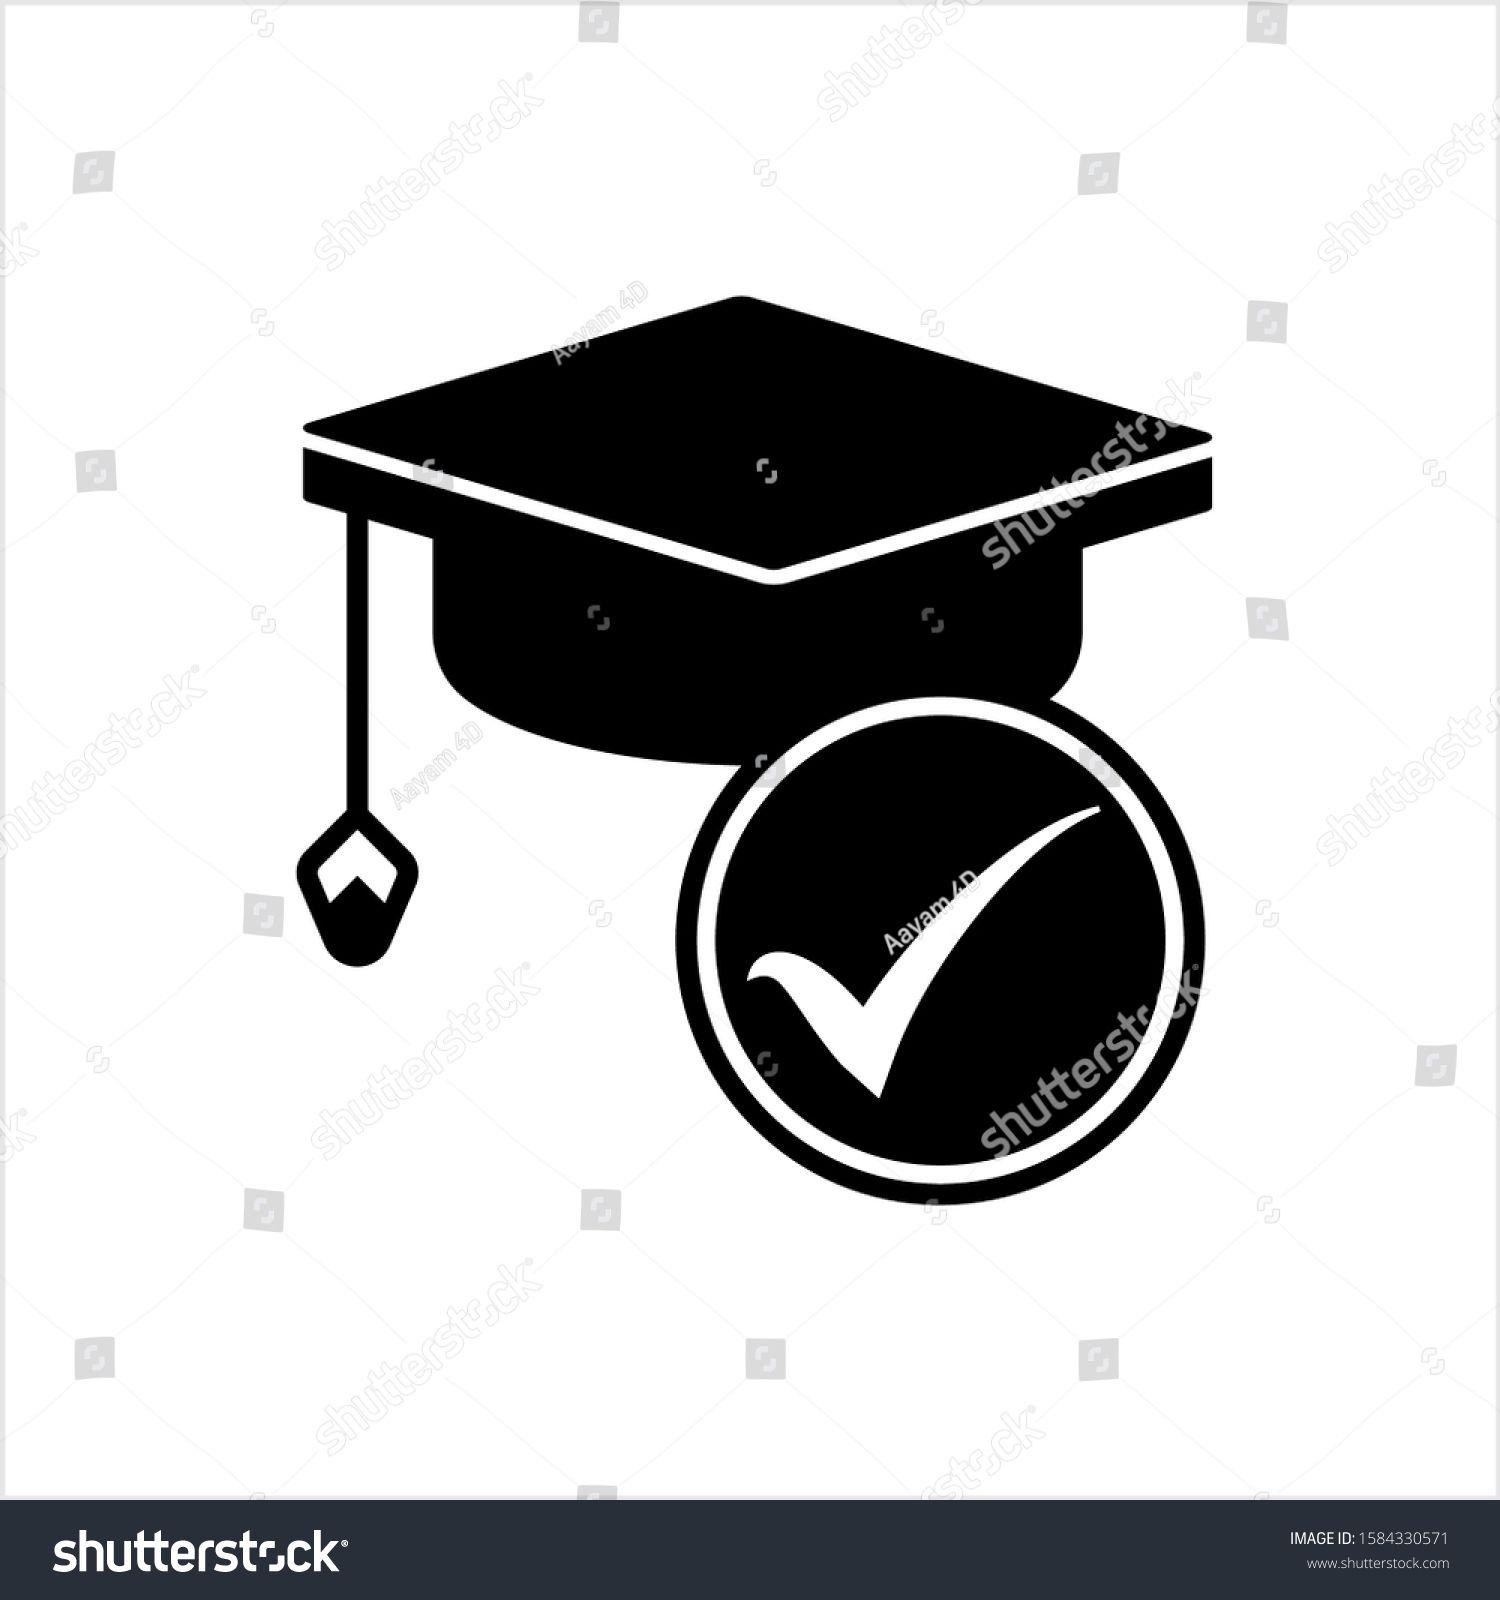 Education Loan Approved Icon Graduation Cap Icon Bachelor Cap Icon Vector Art Illustration Ad Ad Icon G In 2020 Vector Art Illustration Art Logo Graduation Cap